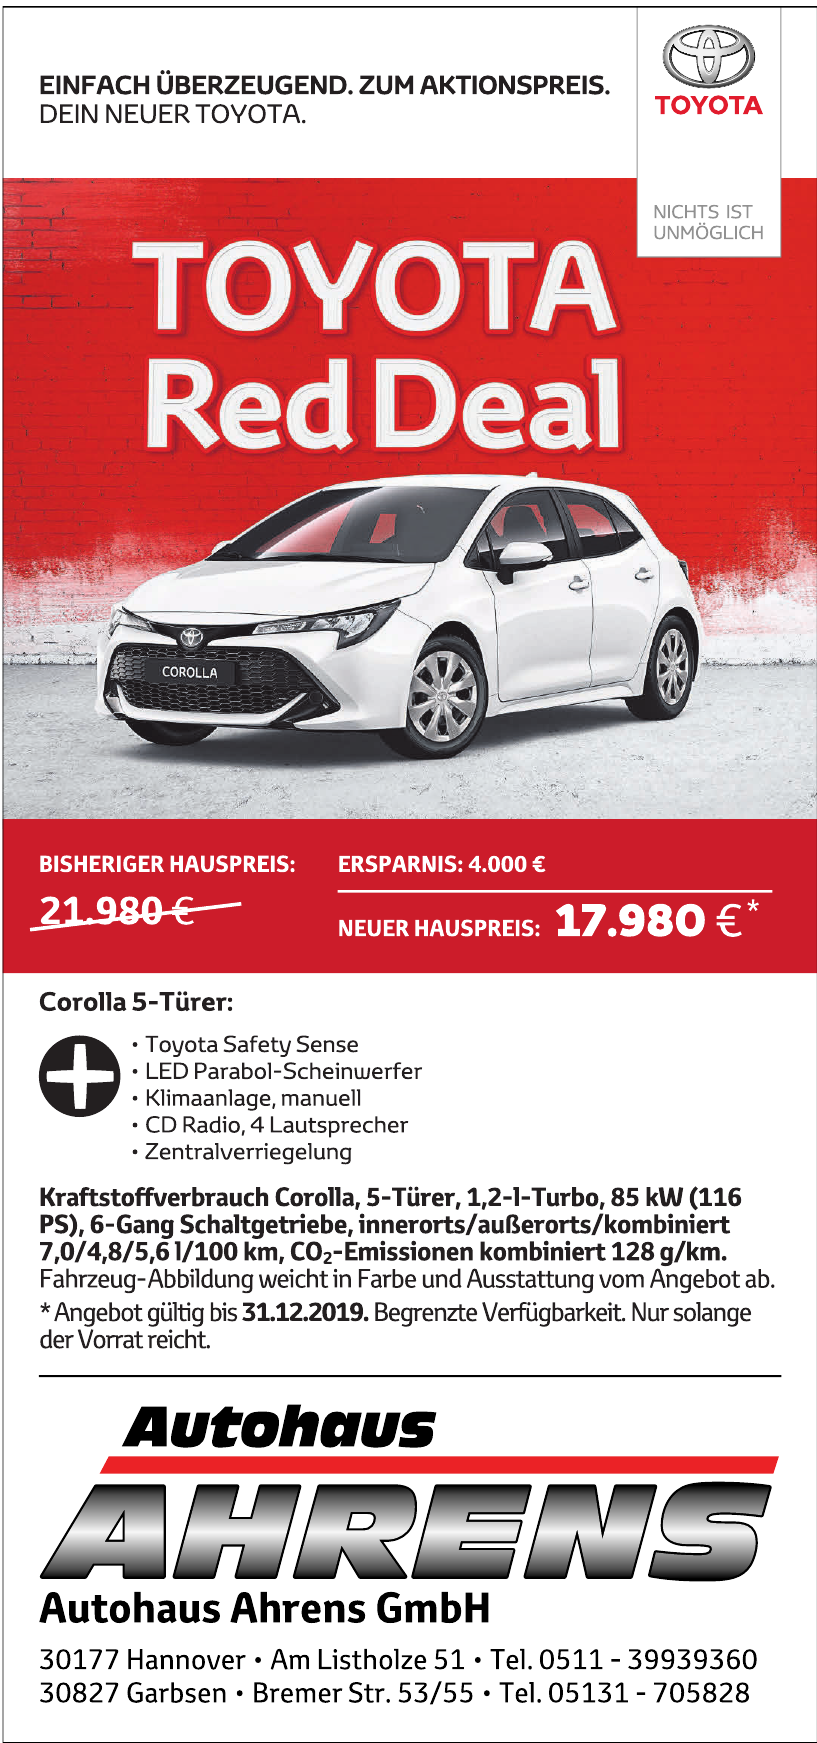 Autohaus Ahrens GmbH